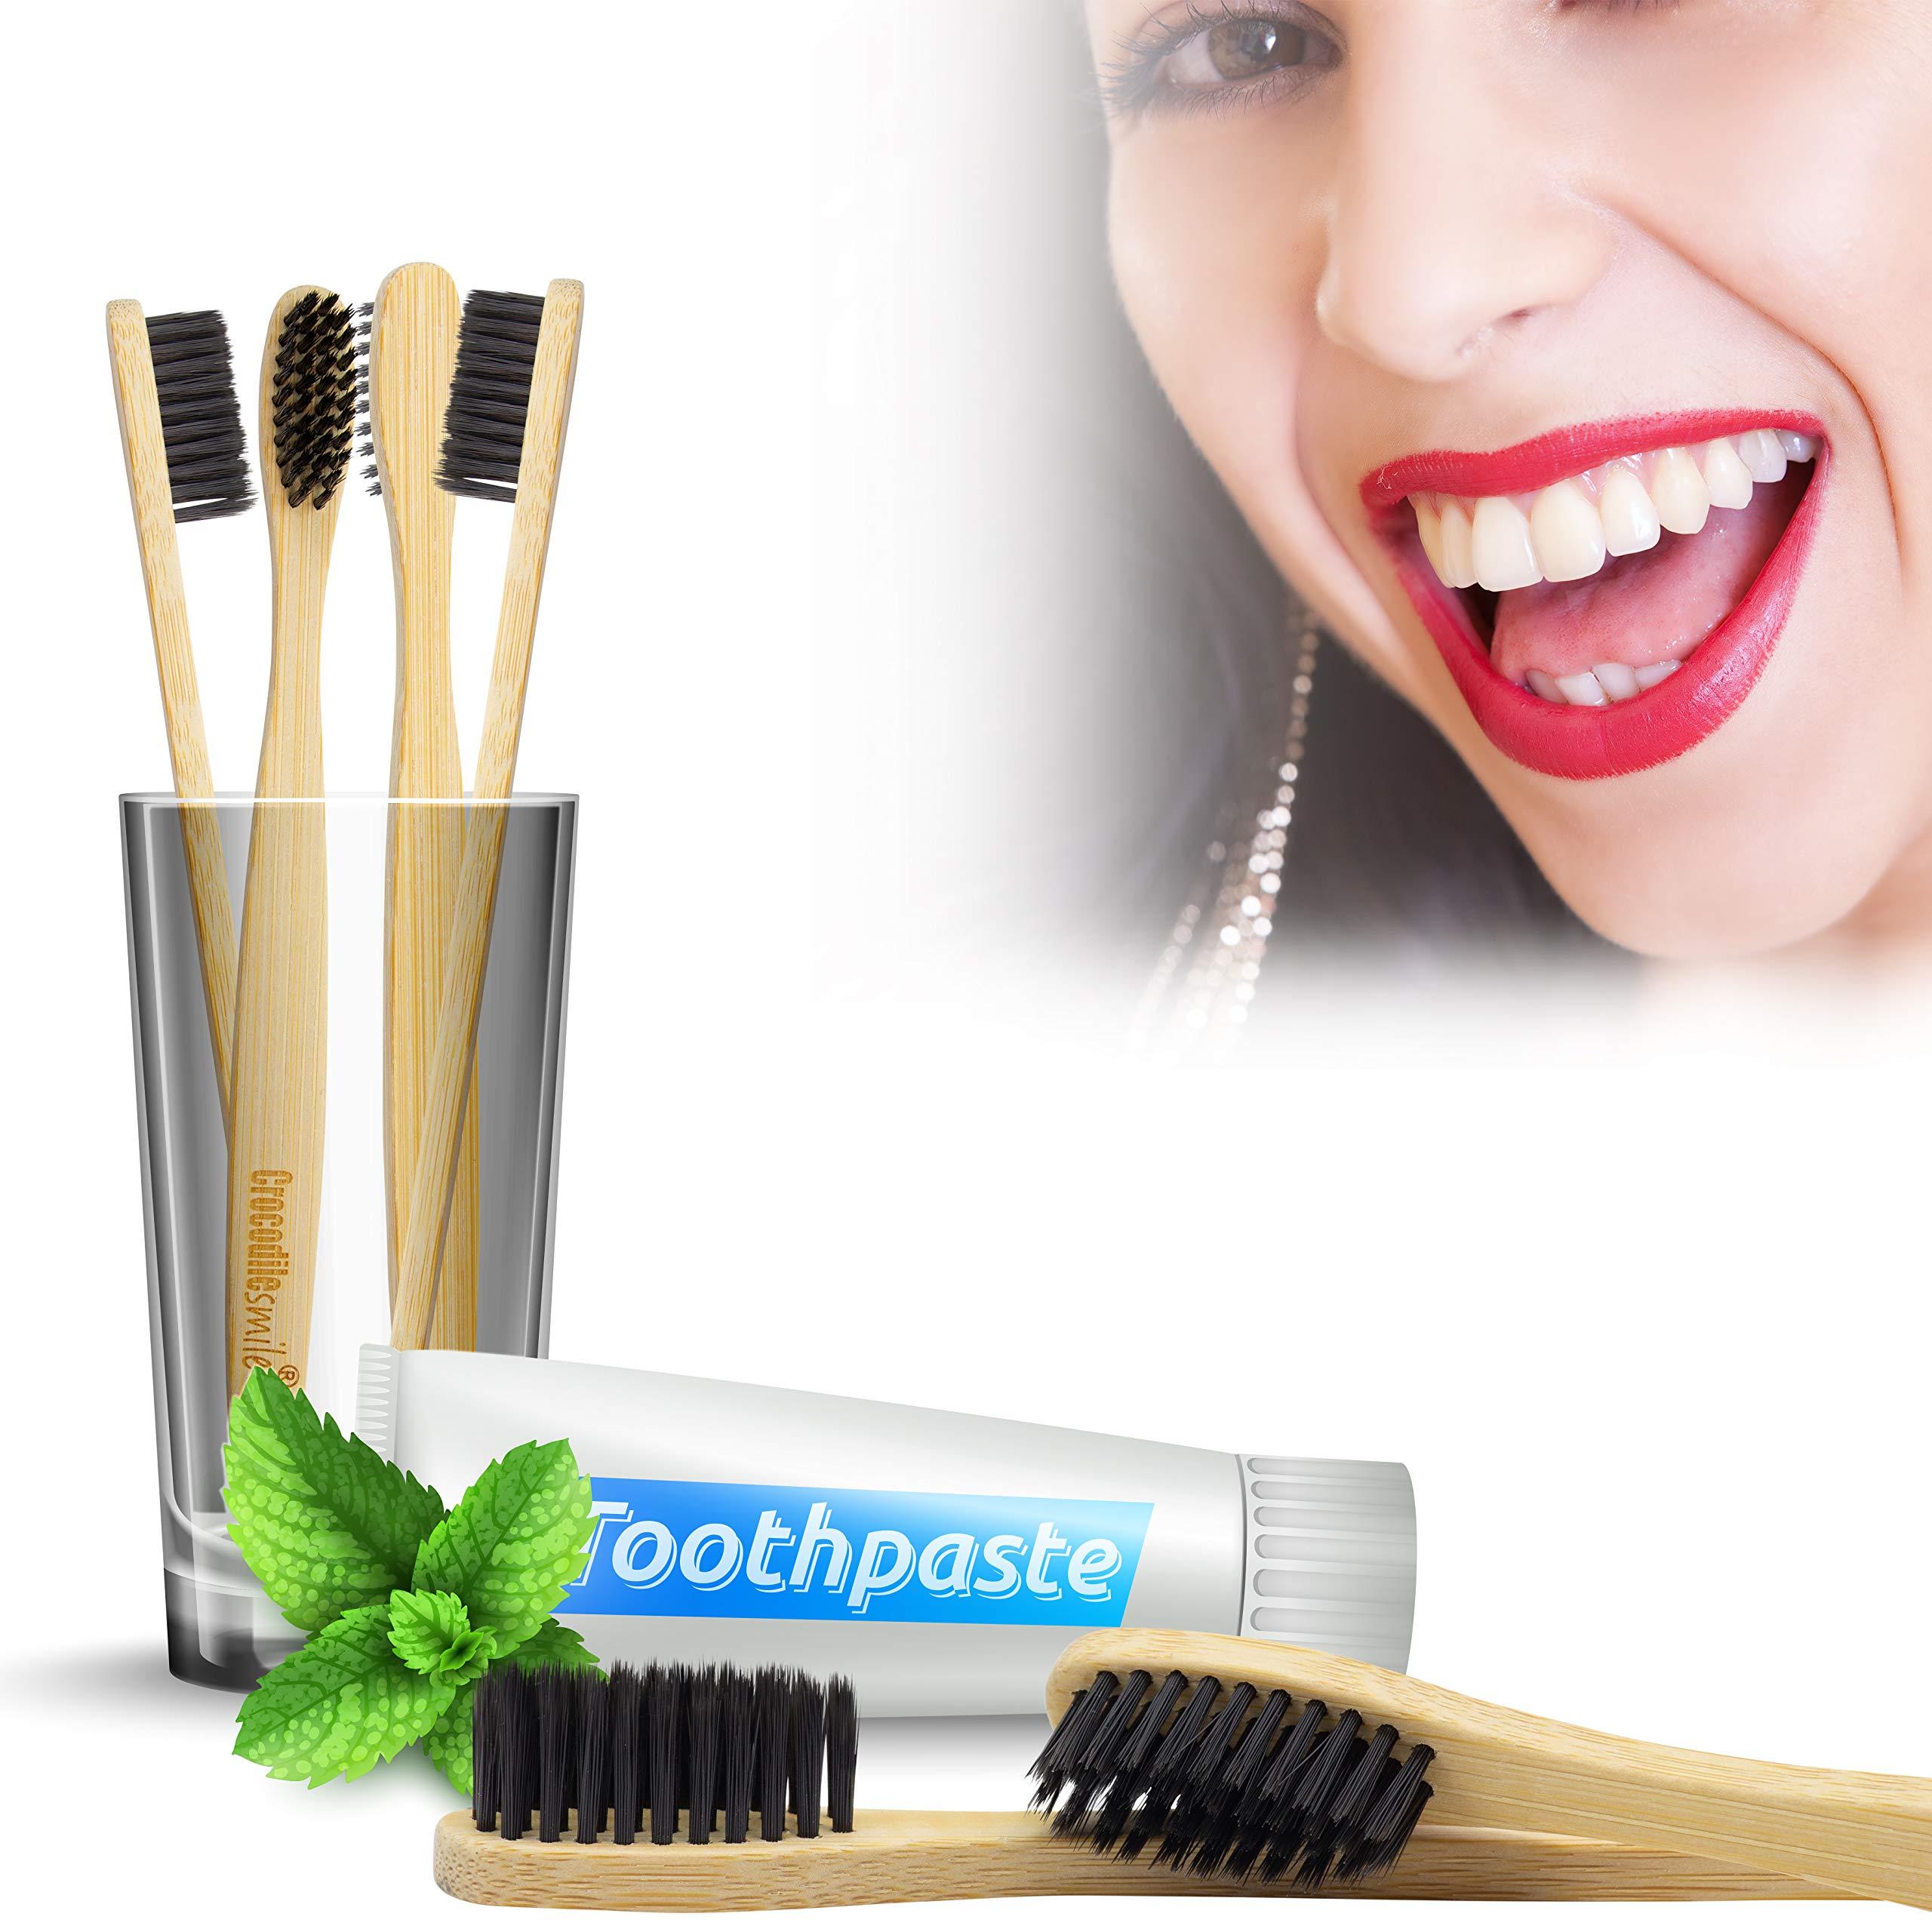 Bambus Zahnbürsten 4 Stück I Nachhaltige & Vegane Holzzahnbürste I weiche Borsten I 4er Pack natürliche Öko Zahnbürste 100% frei von BPA